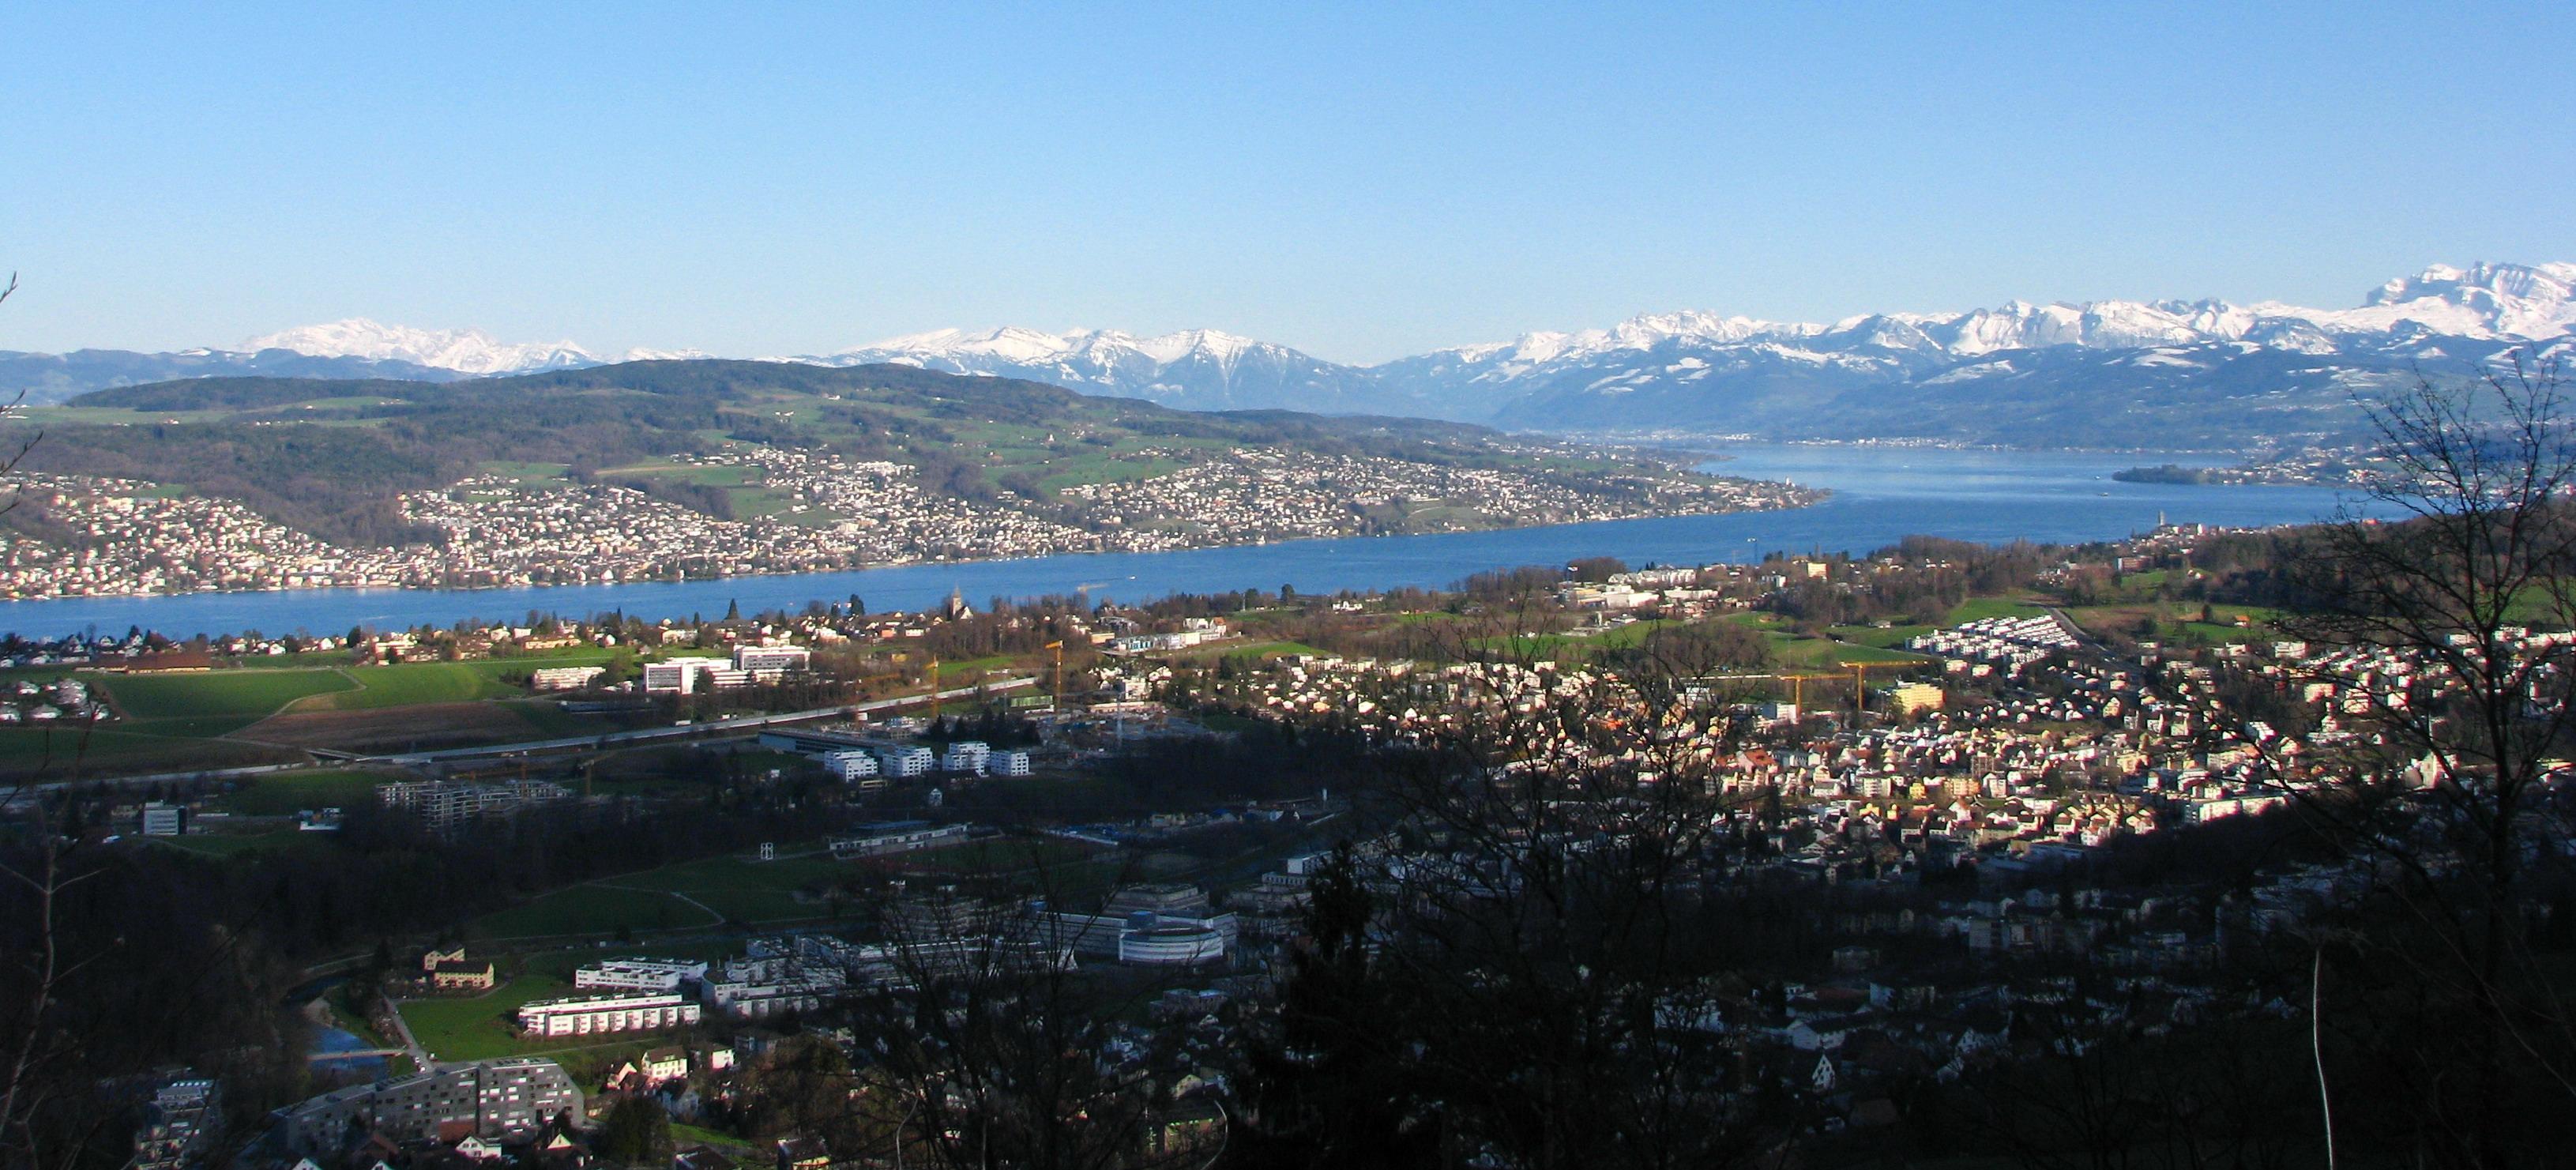 Lake Zurich Il Hotels Motels